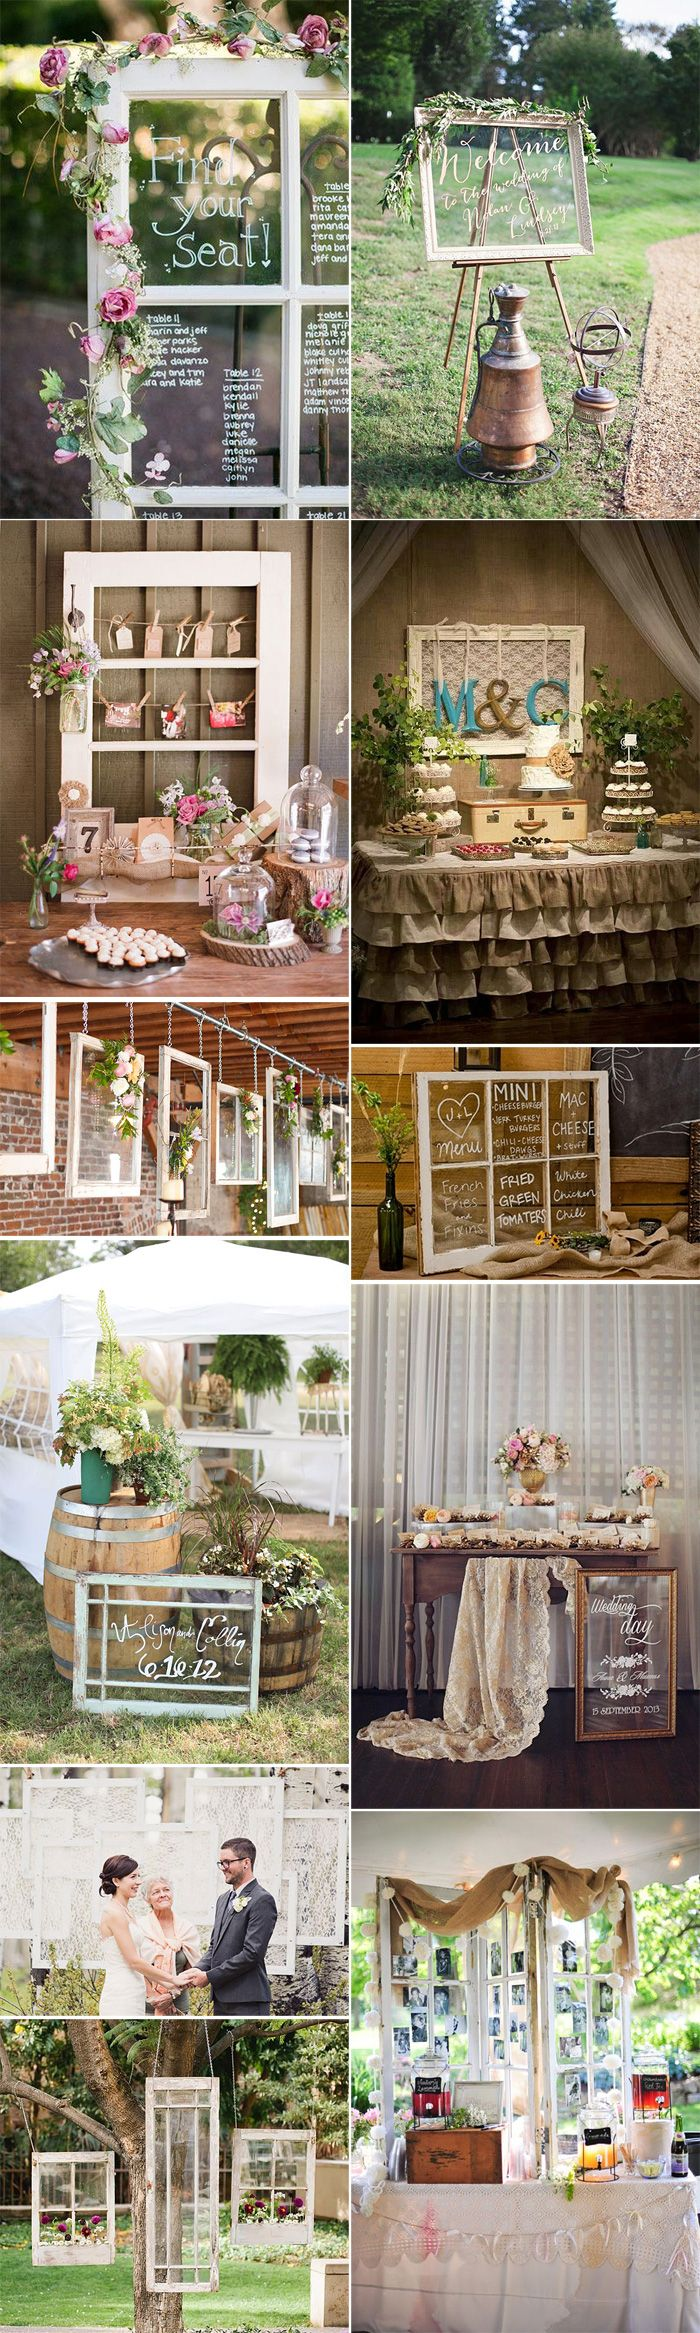 Ideas geniales para decorar vuestra boda o fiesta con marcos de ventana antiguos.